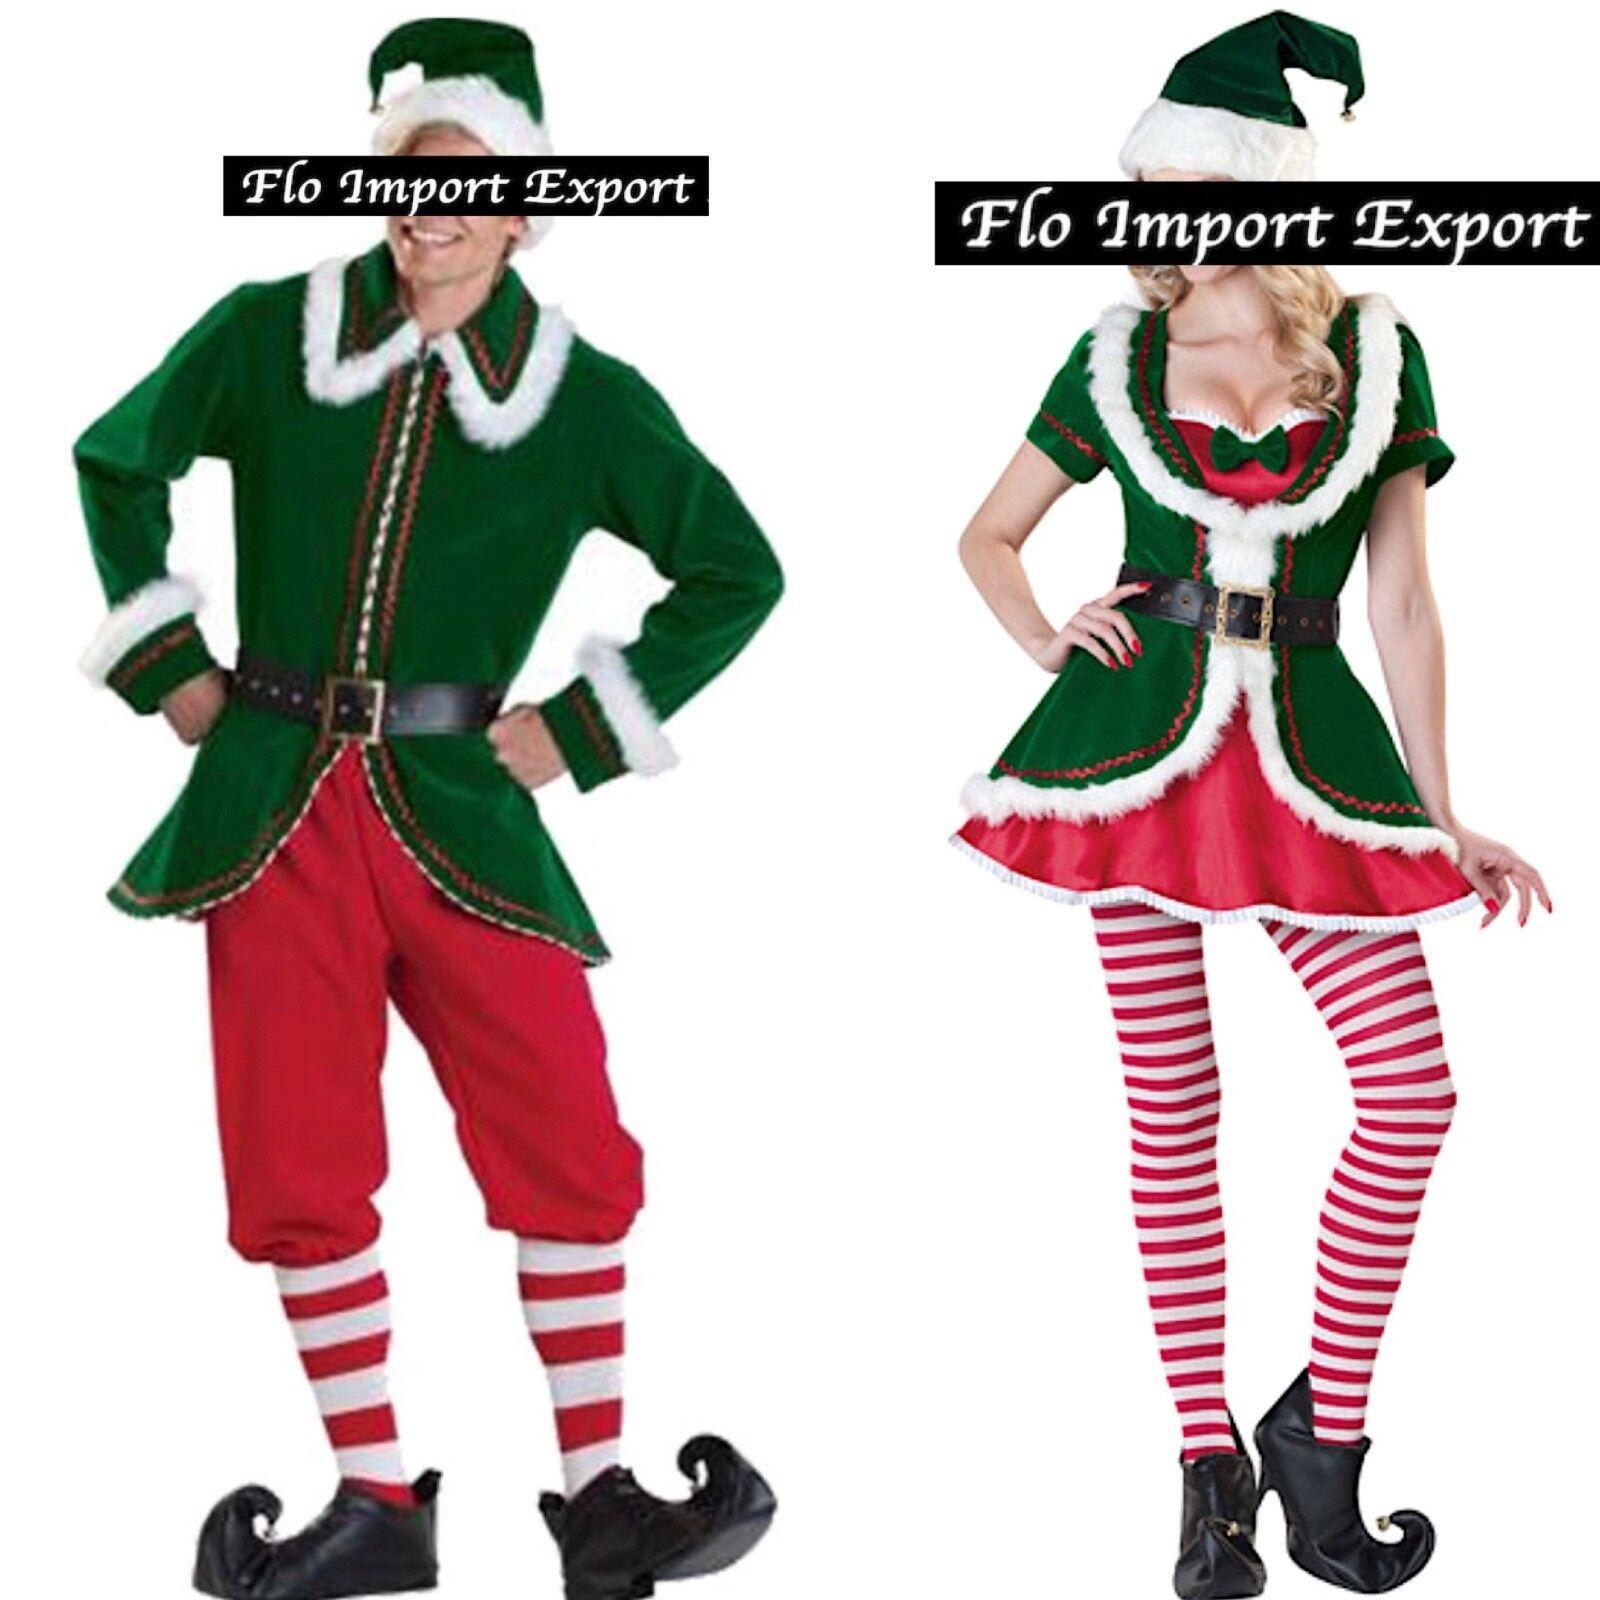 Christmas Elf Costume Family Set Santa Helper Elf Dress with Hat and Socks